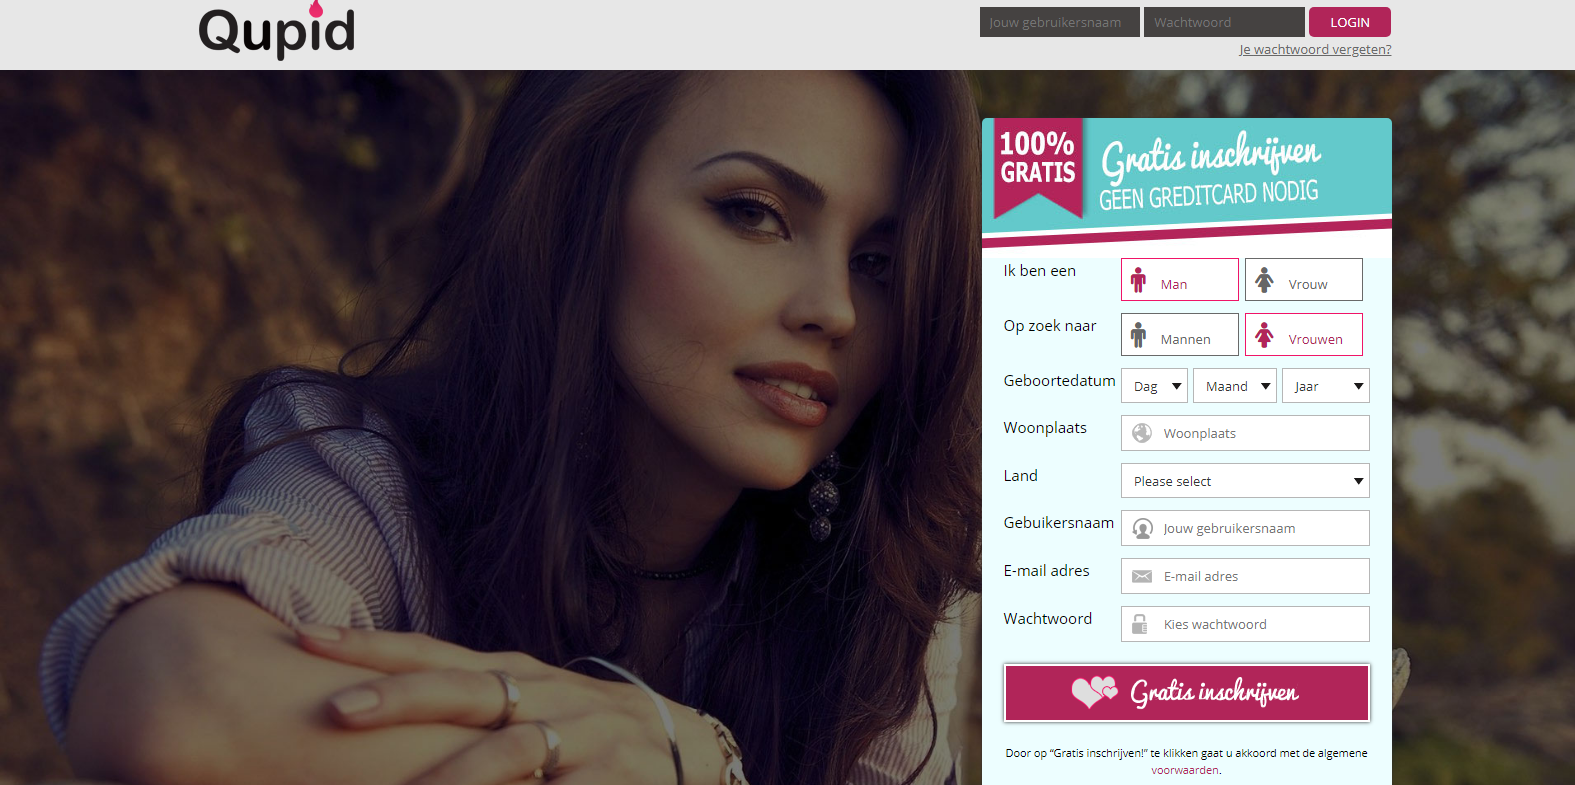 dating website geen creditcard nodig